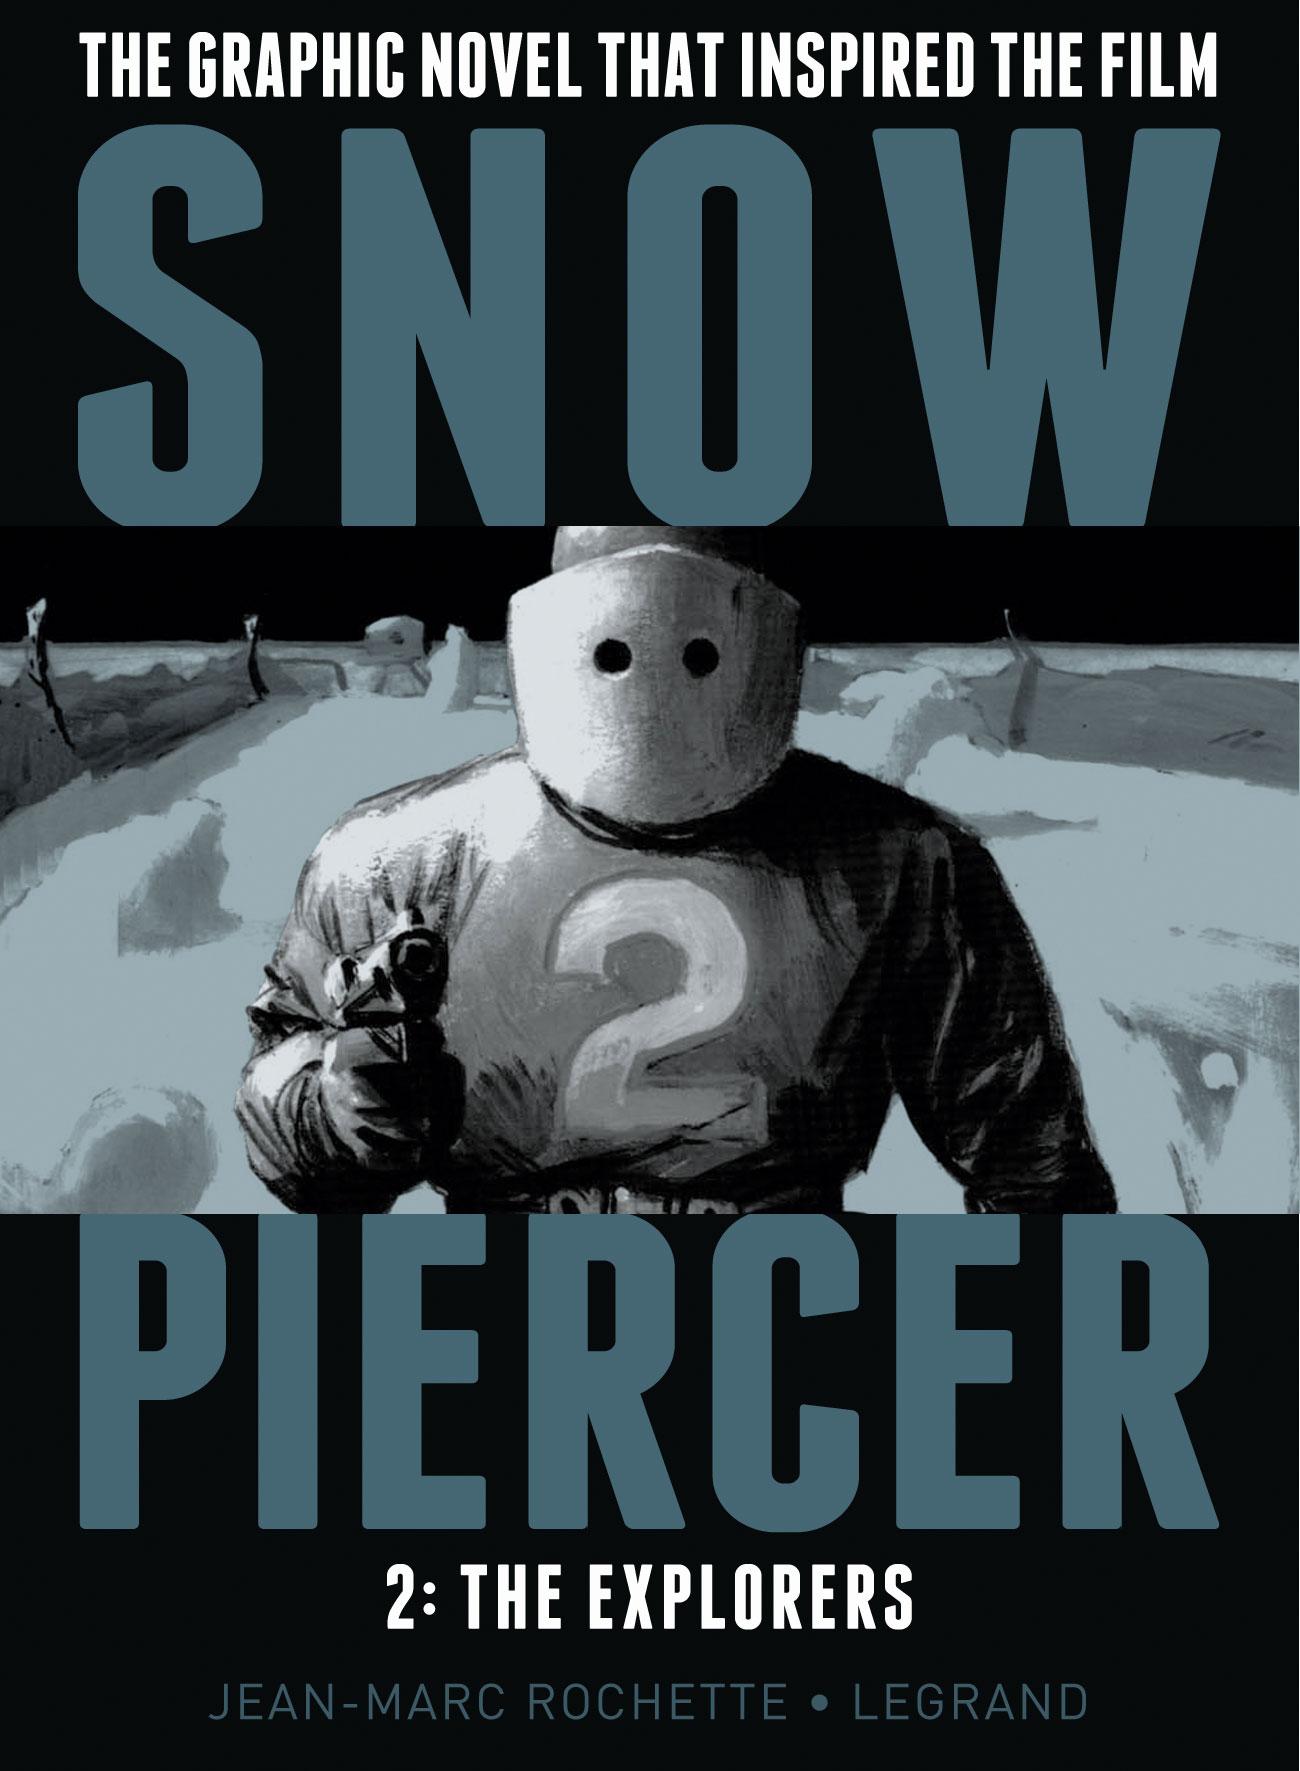 Snow-Piercer2